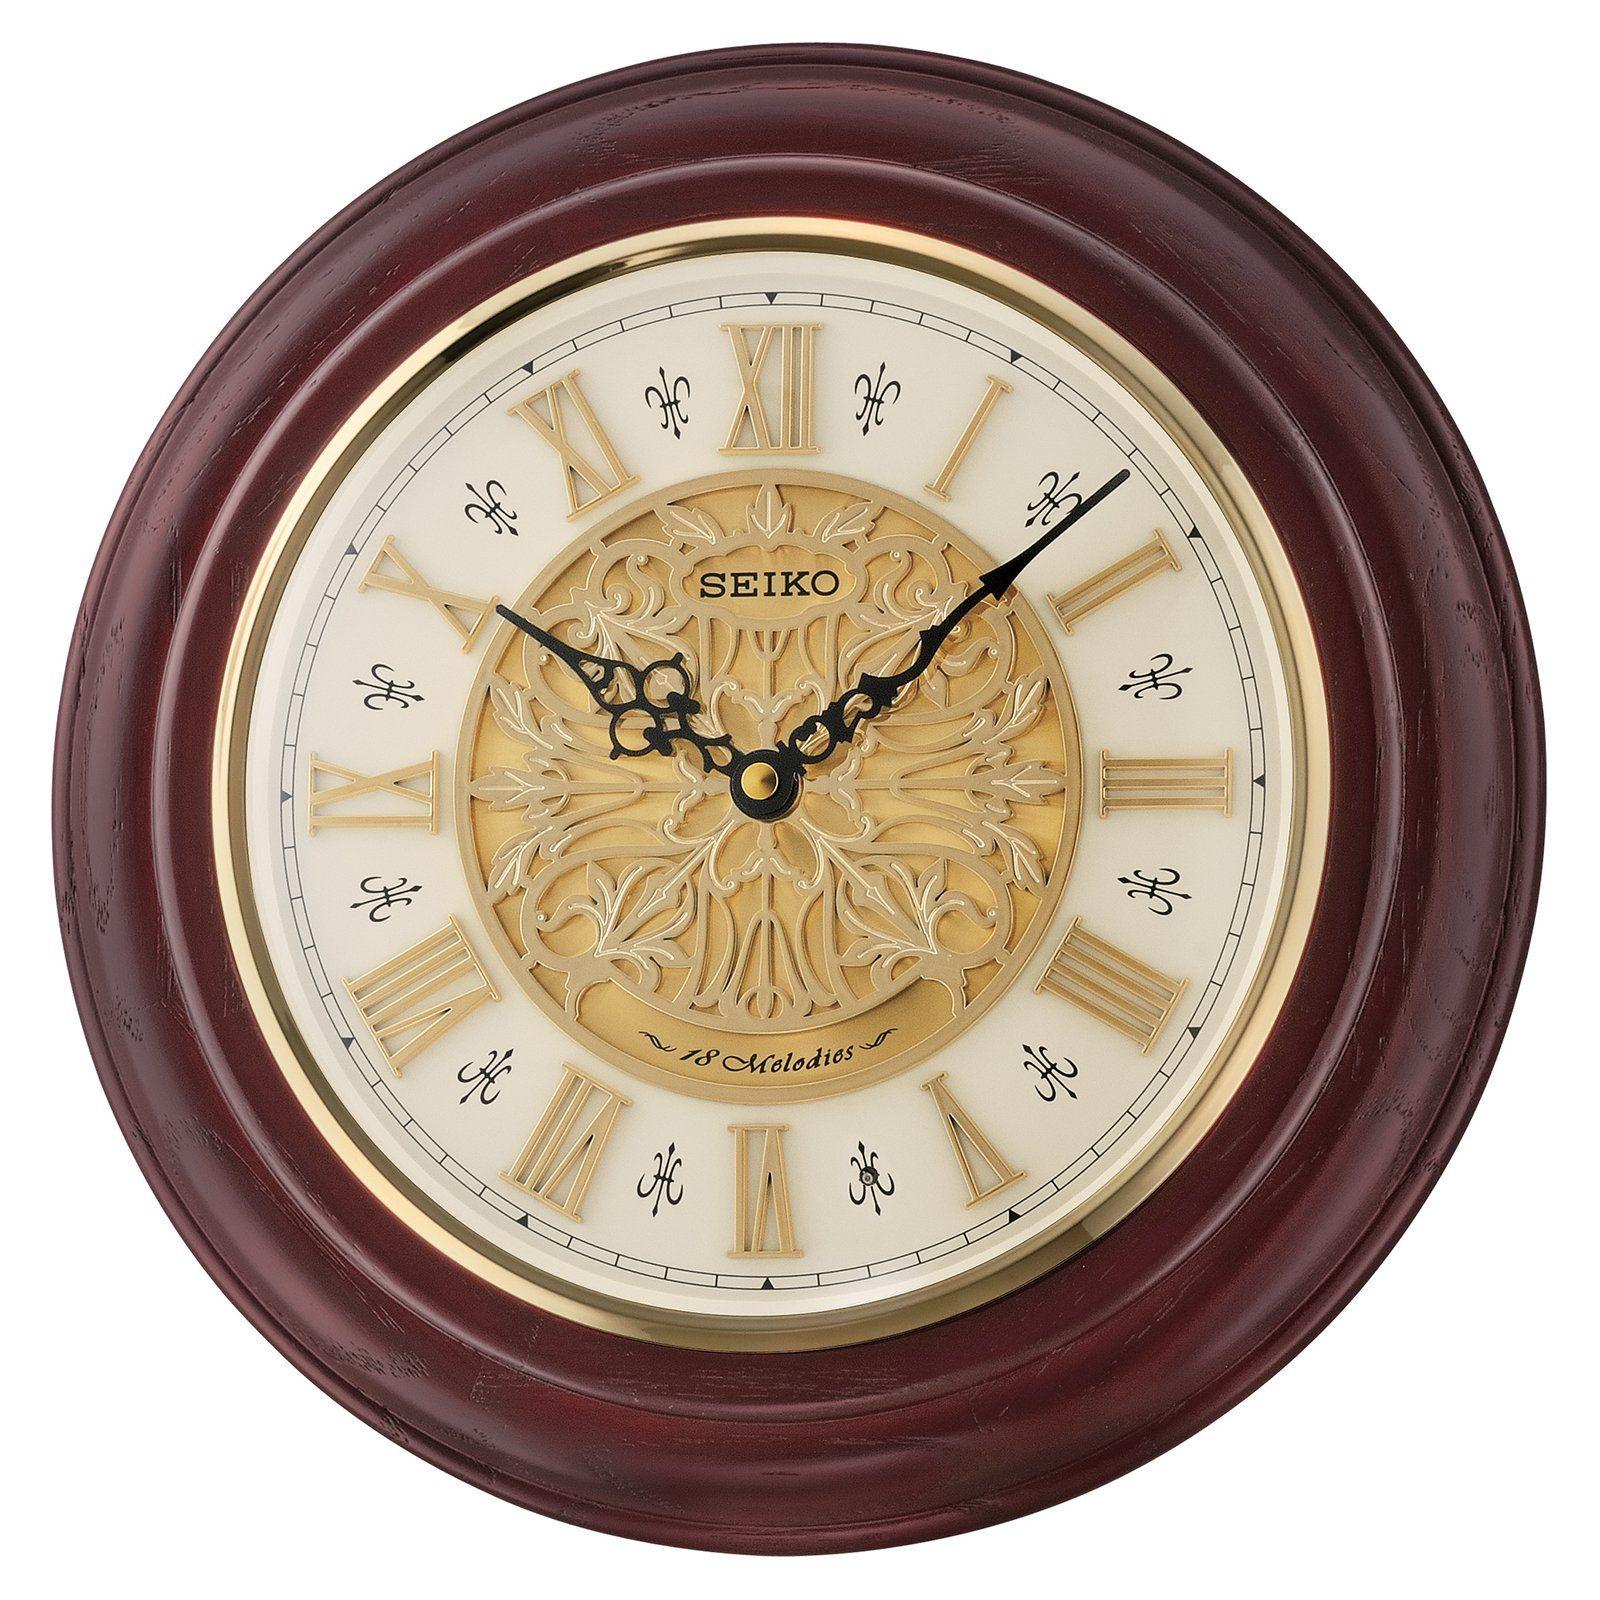 Seiko Valetta Wall Clock Www Hayneedle Com Unique Clocks